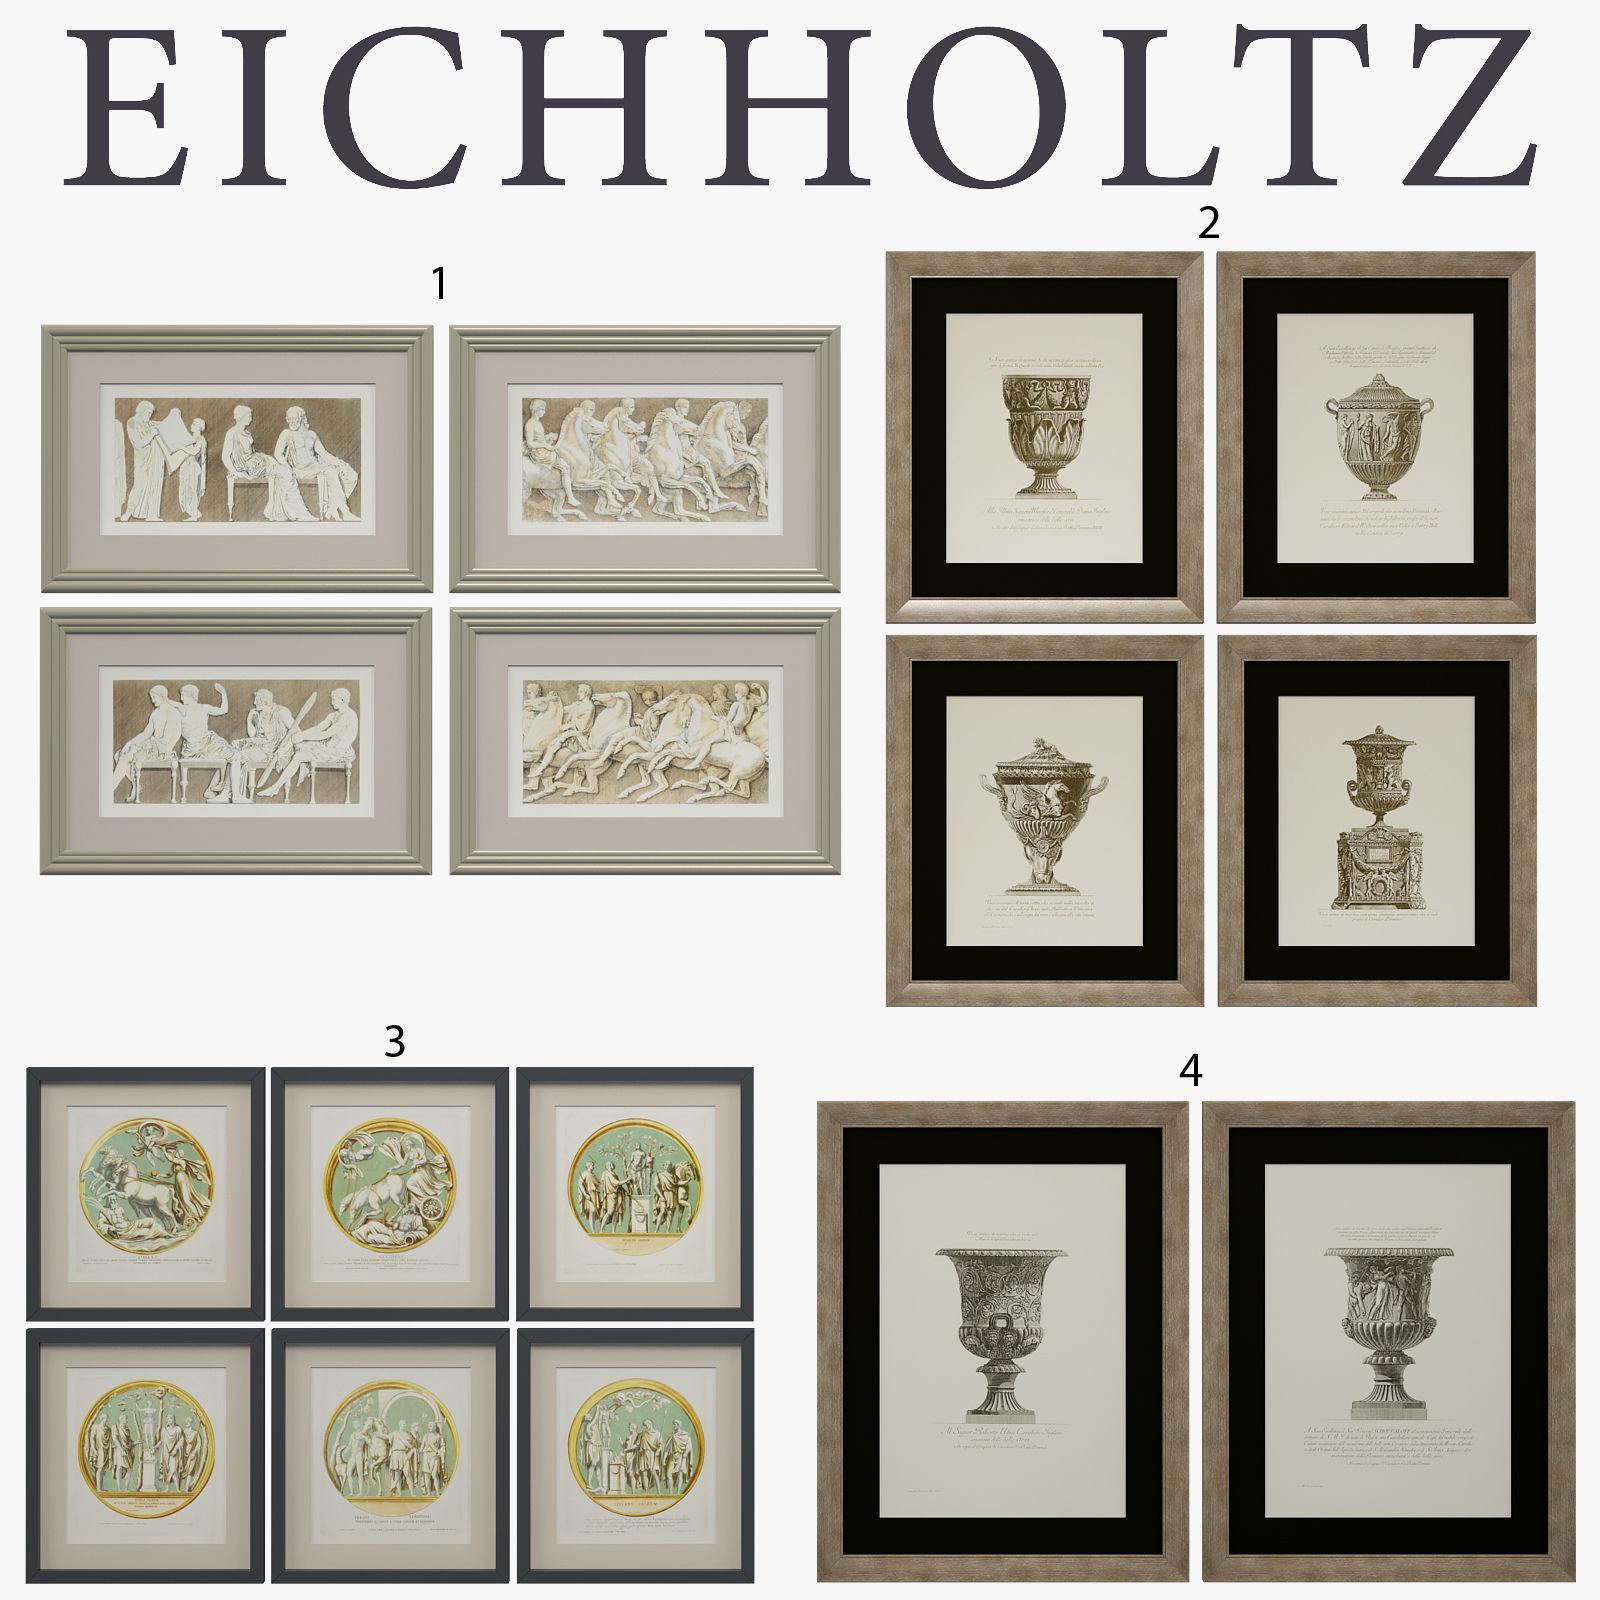 Eichholtz Prints 15